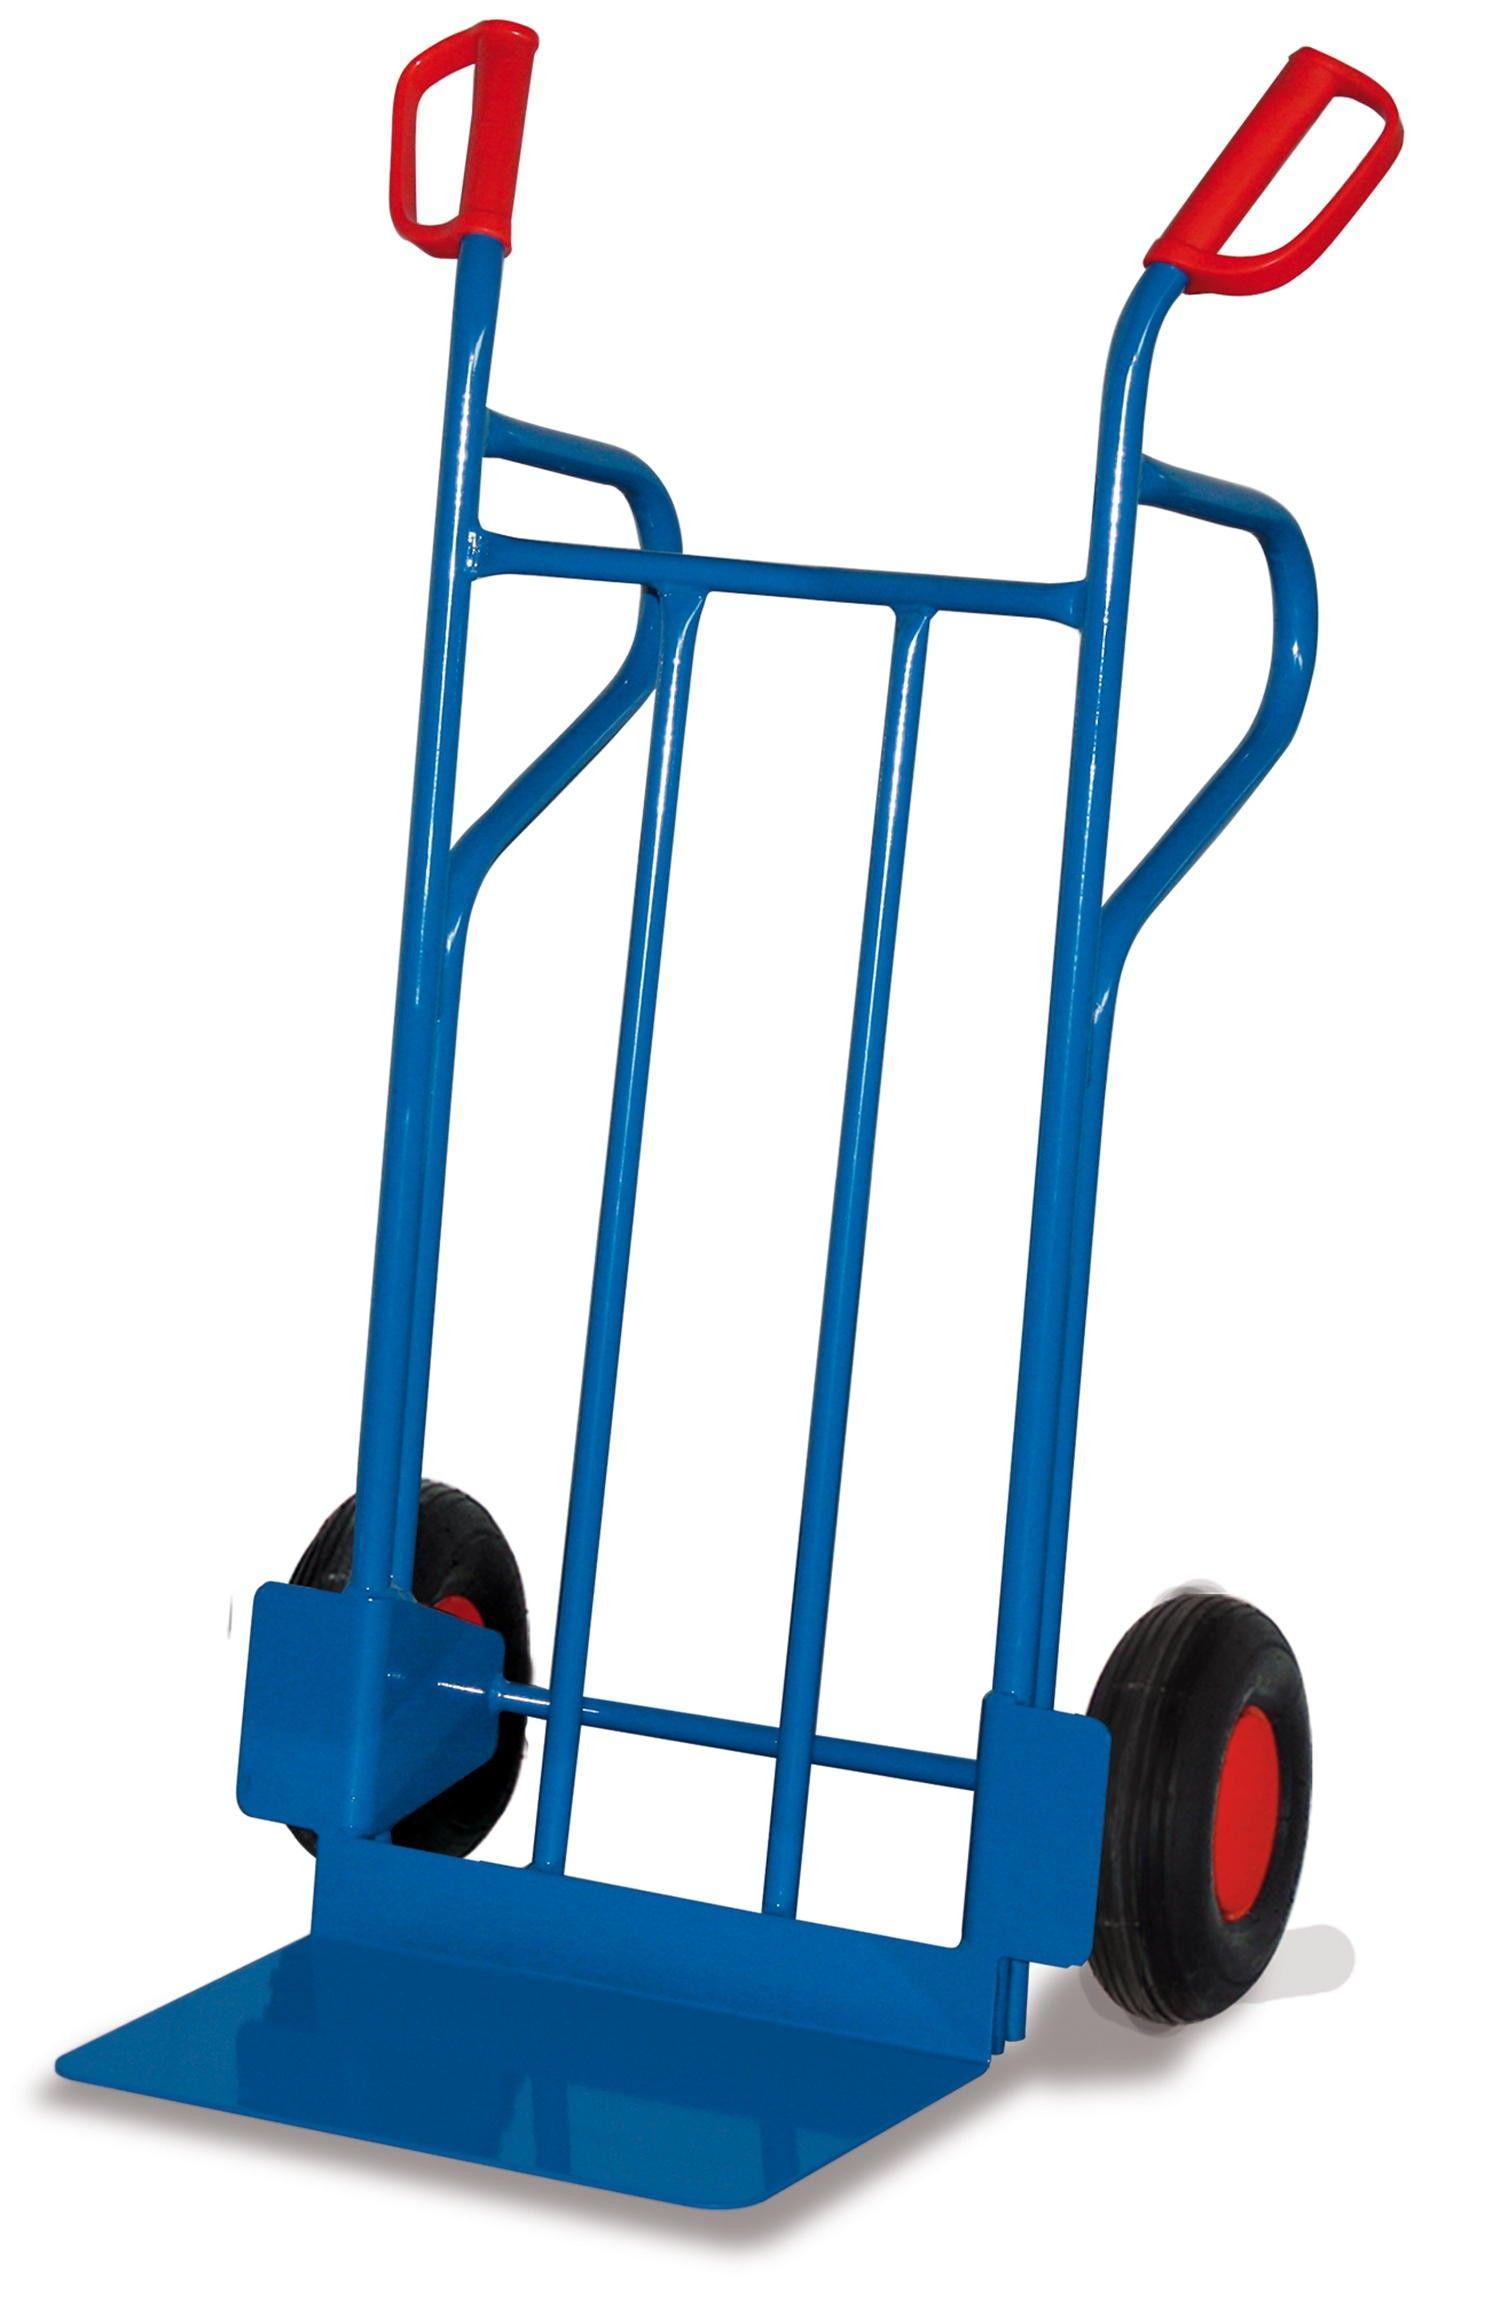 GTARDO.DE:  Stahlrohrkarre, Tragkraft 250 kg, Maße 686 x 702 x 1185 mm, Schaufel 480 x 297 mm, Rad 260 x 85 mm, Höhe 1185 mm 100,00 €